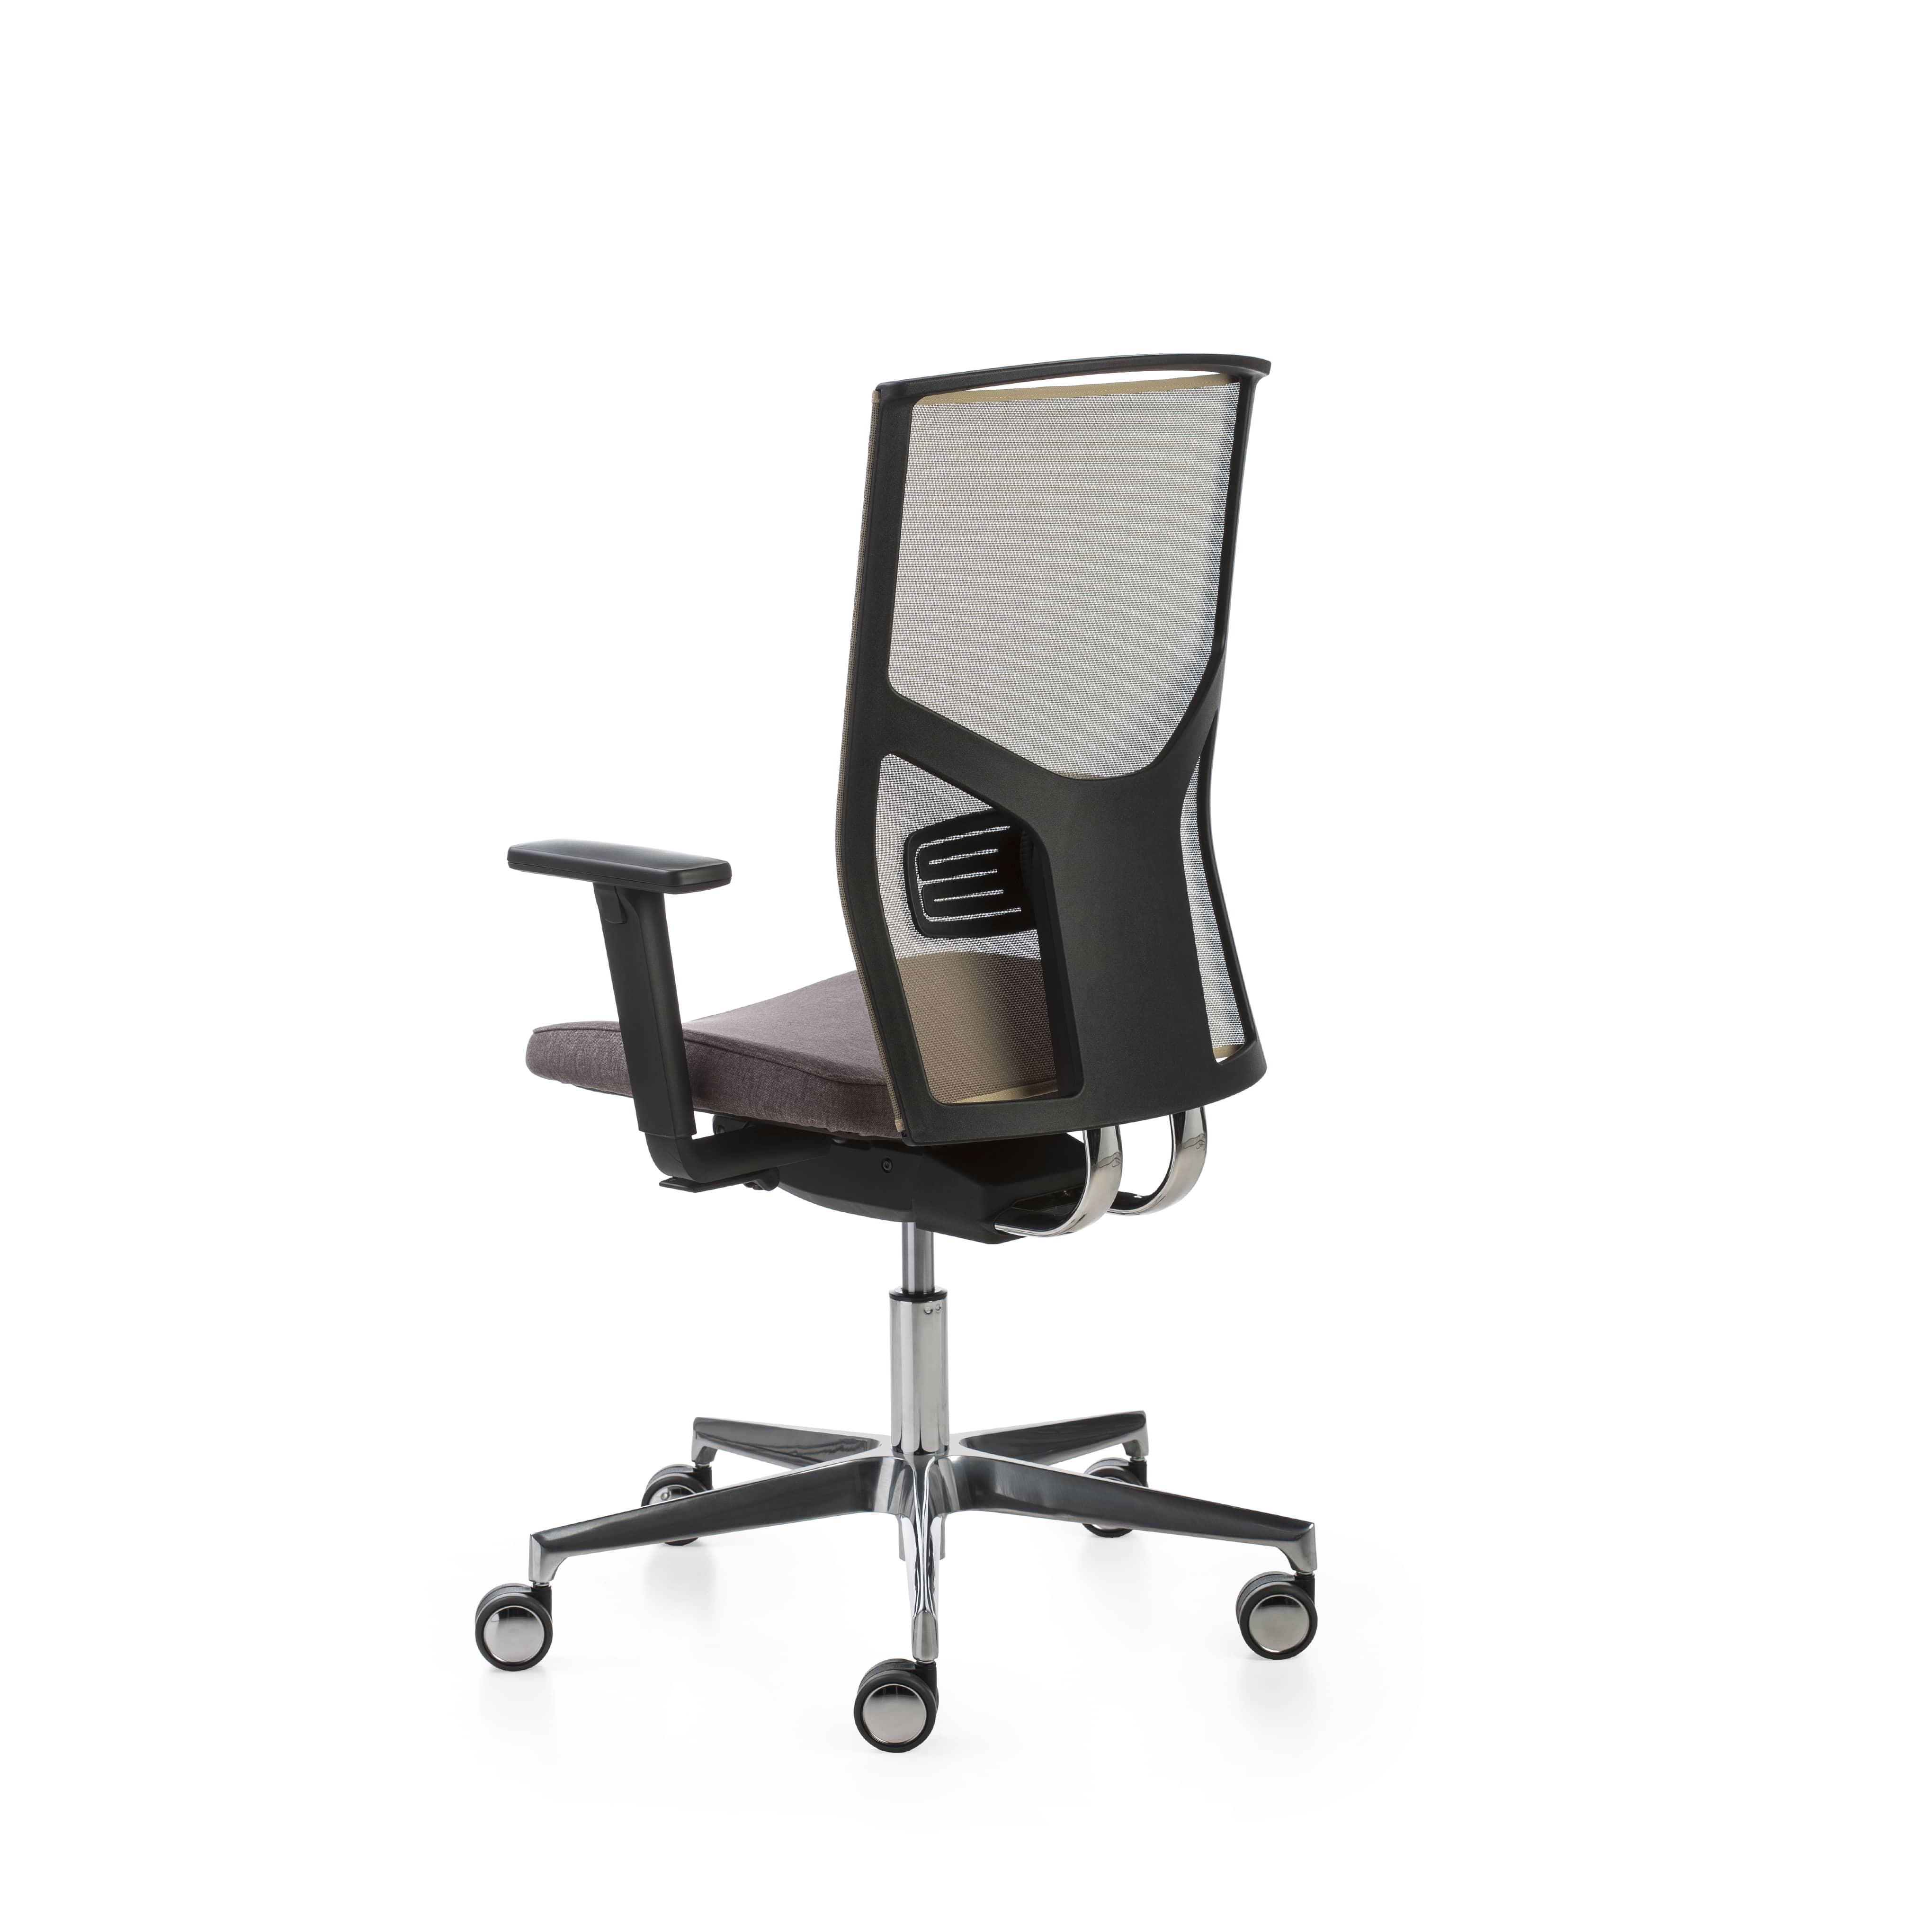 sillas-oficina-General-muebles-paco-caballero-454-5caf5d925765b